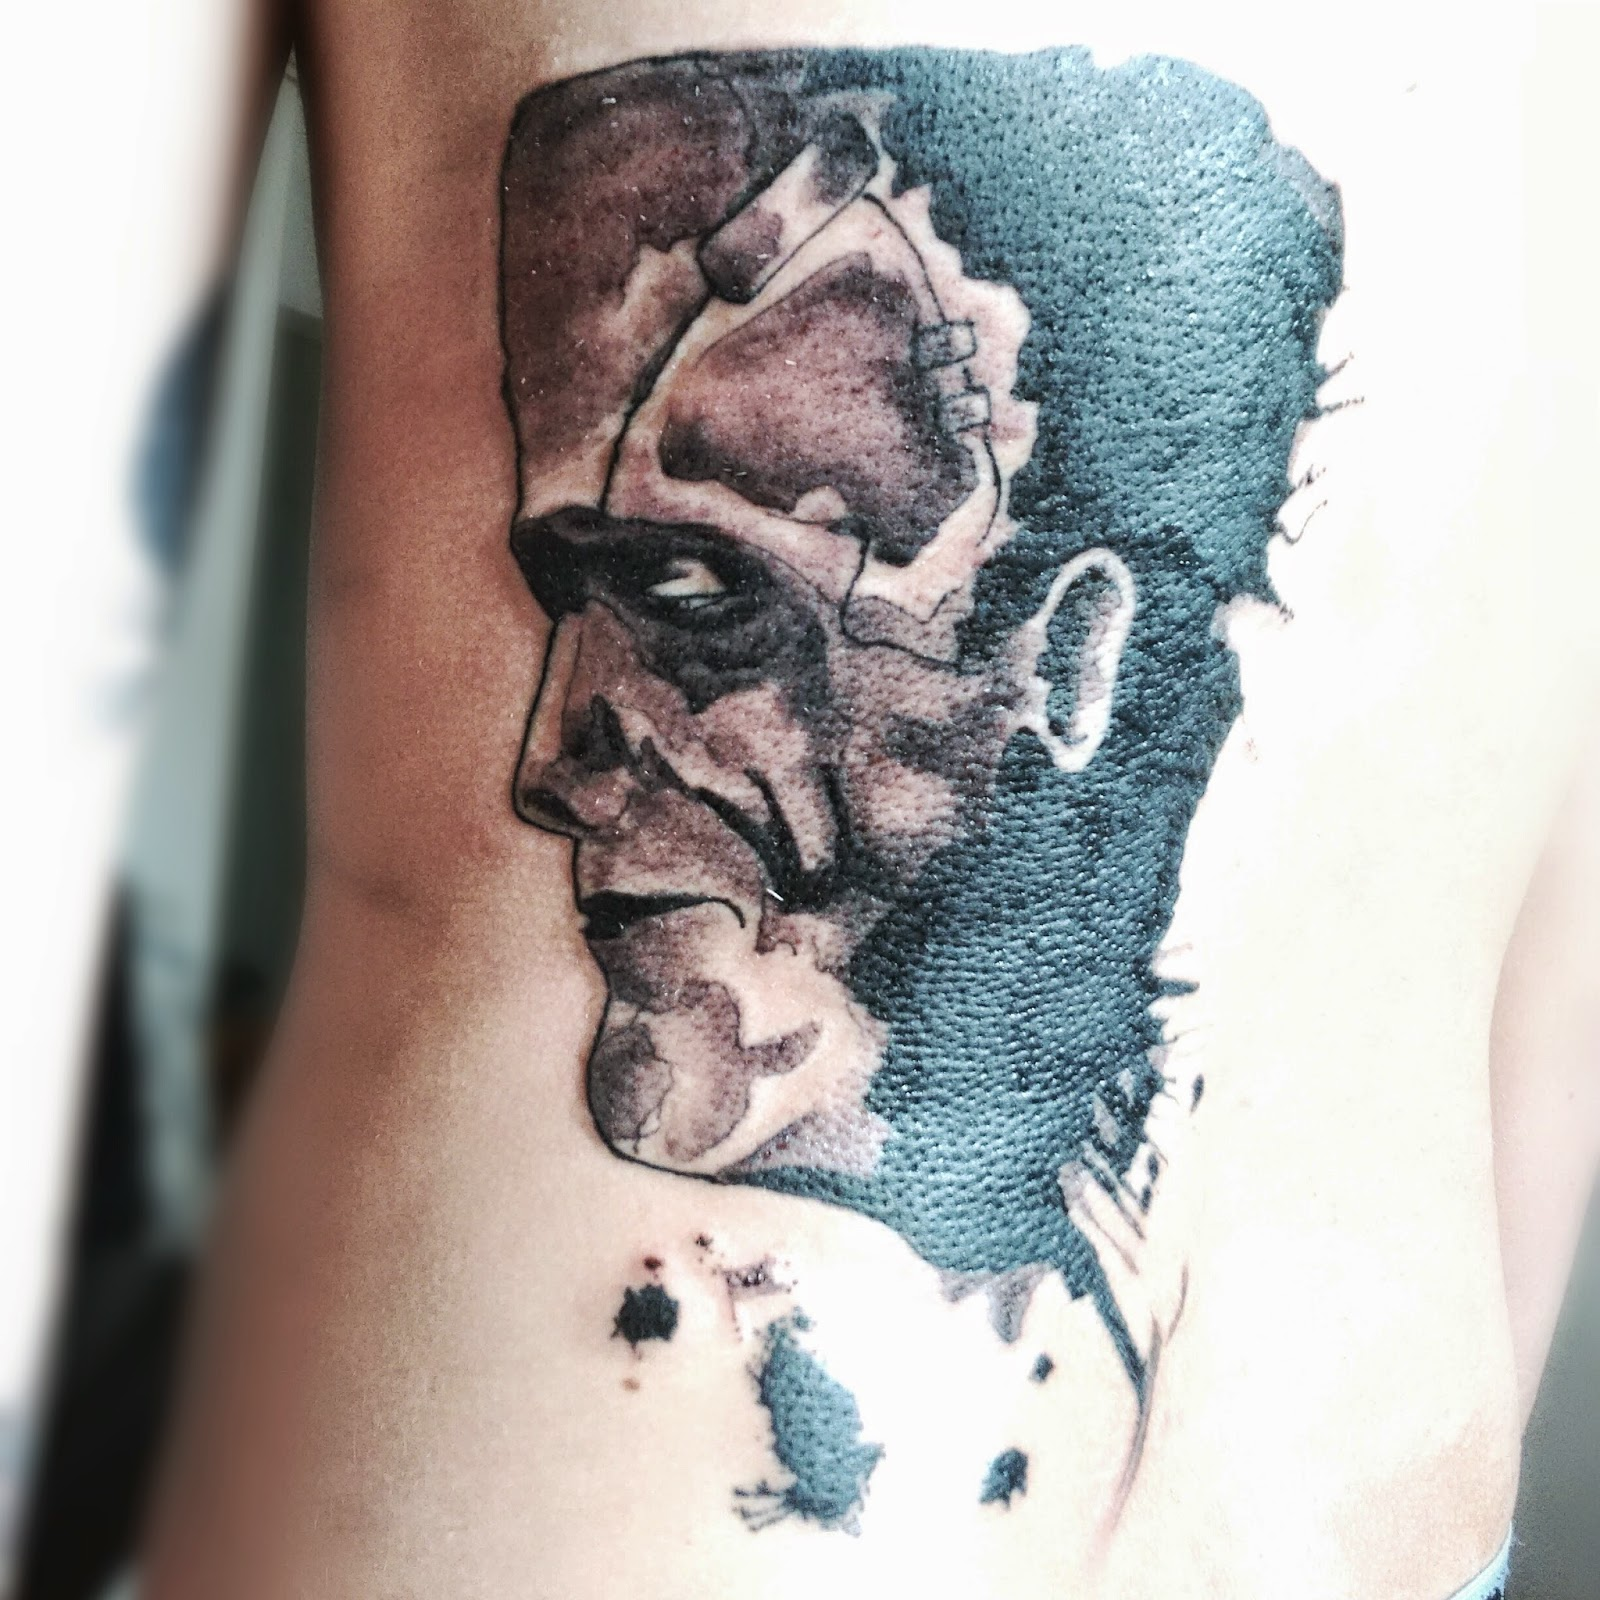 chilligrr, site, web site, portfolio, layout, tumblr, aquarela, watercolor, pinturas, artista, escritor, layout para portfolio, tatuador em curitiba, tatuagem aquarela, tatuagem curitiba, curitiba, tatuagem aquarela em curitiba, lora zombie, galaxy, totoro, tatuagem aquarela galaxia, tatuagem galaxia, tatuagem gato,travis barker, frida kahlo, kahlo, frida, pintura frida, imagens frita, desenho frida, desenho, pintura, aquarela, frida kahlo pintura, frida kahlo retrato, frakenstein, mr. and mrs. frankenstein, mr frankenstein, bride of frankenstein, mrs frankenstein, watercolor tattoo,